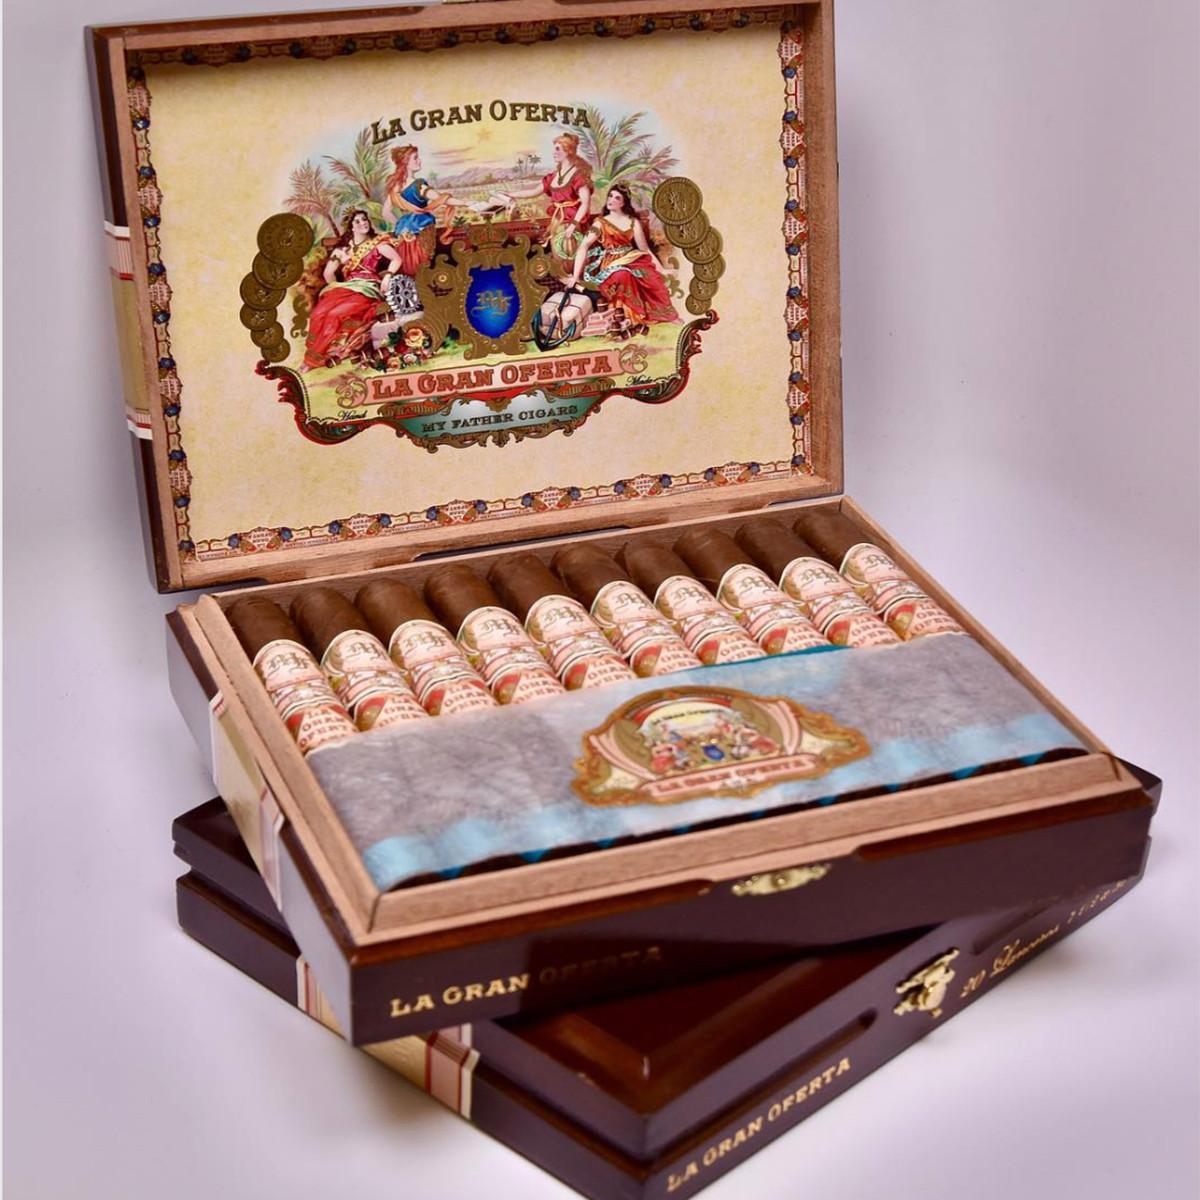 My Father La Gran Oferta Robusto (5x50 / Box of 20)